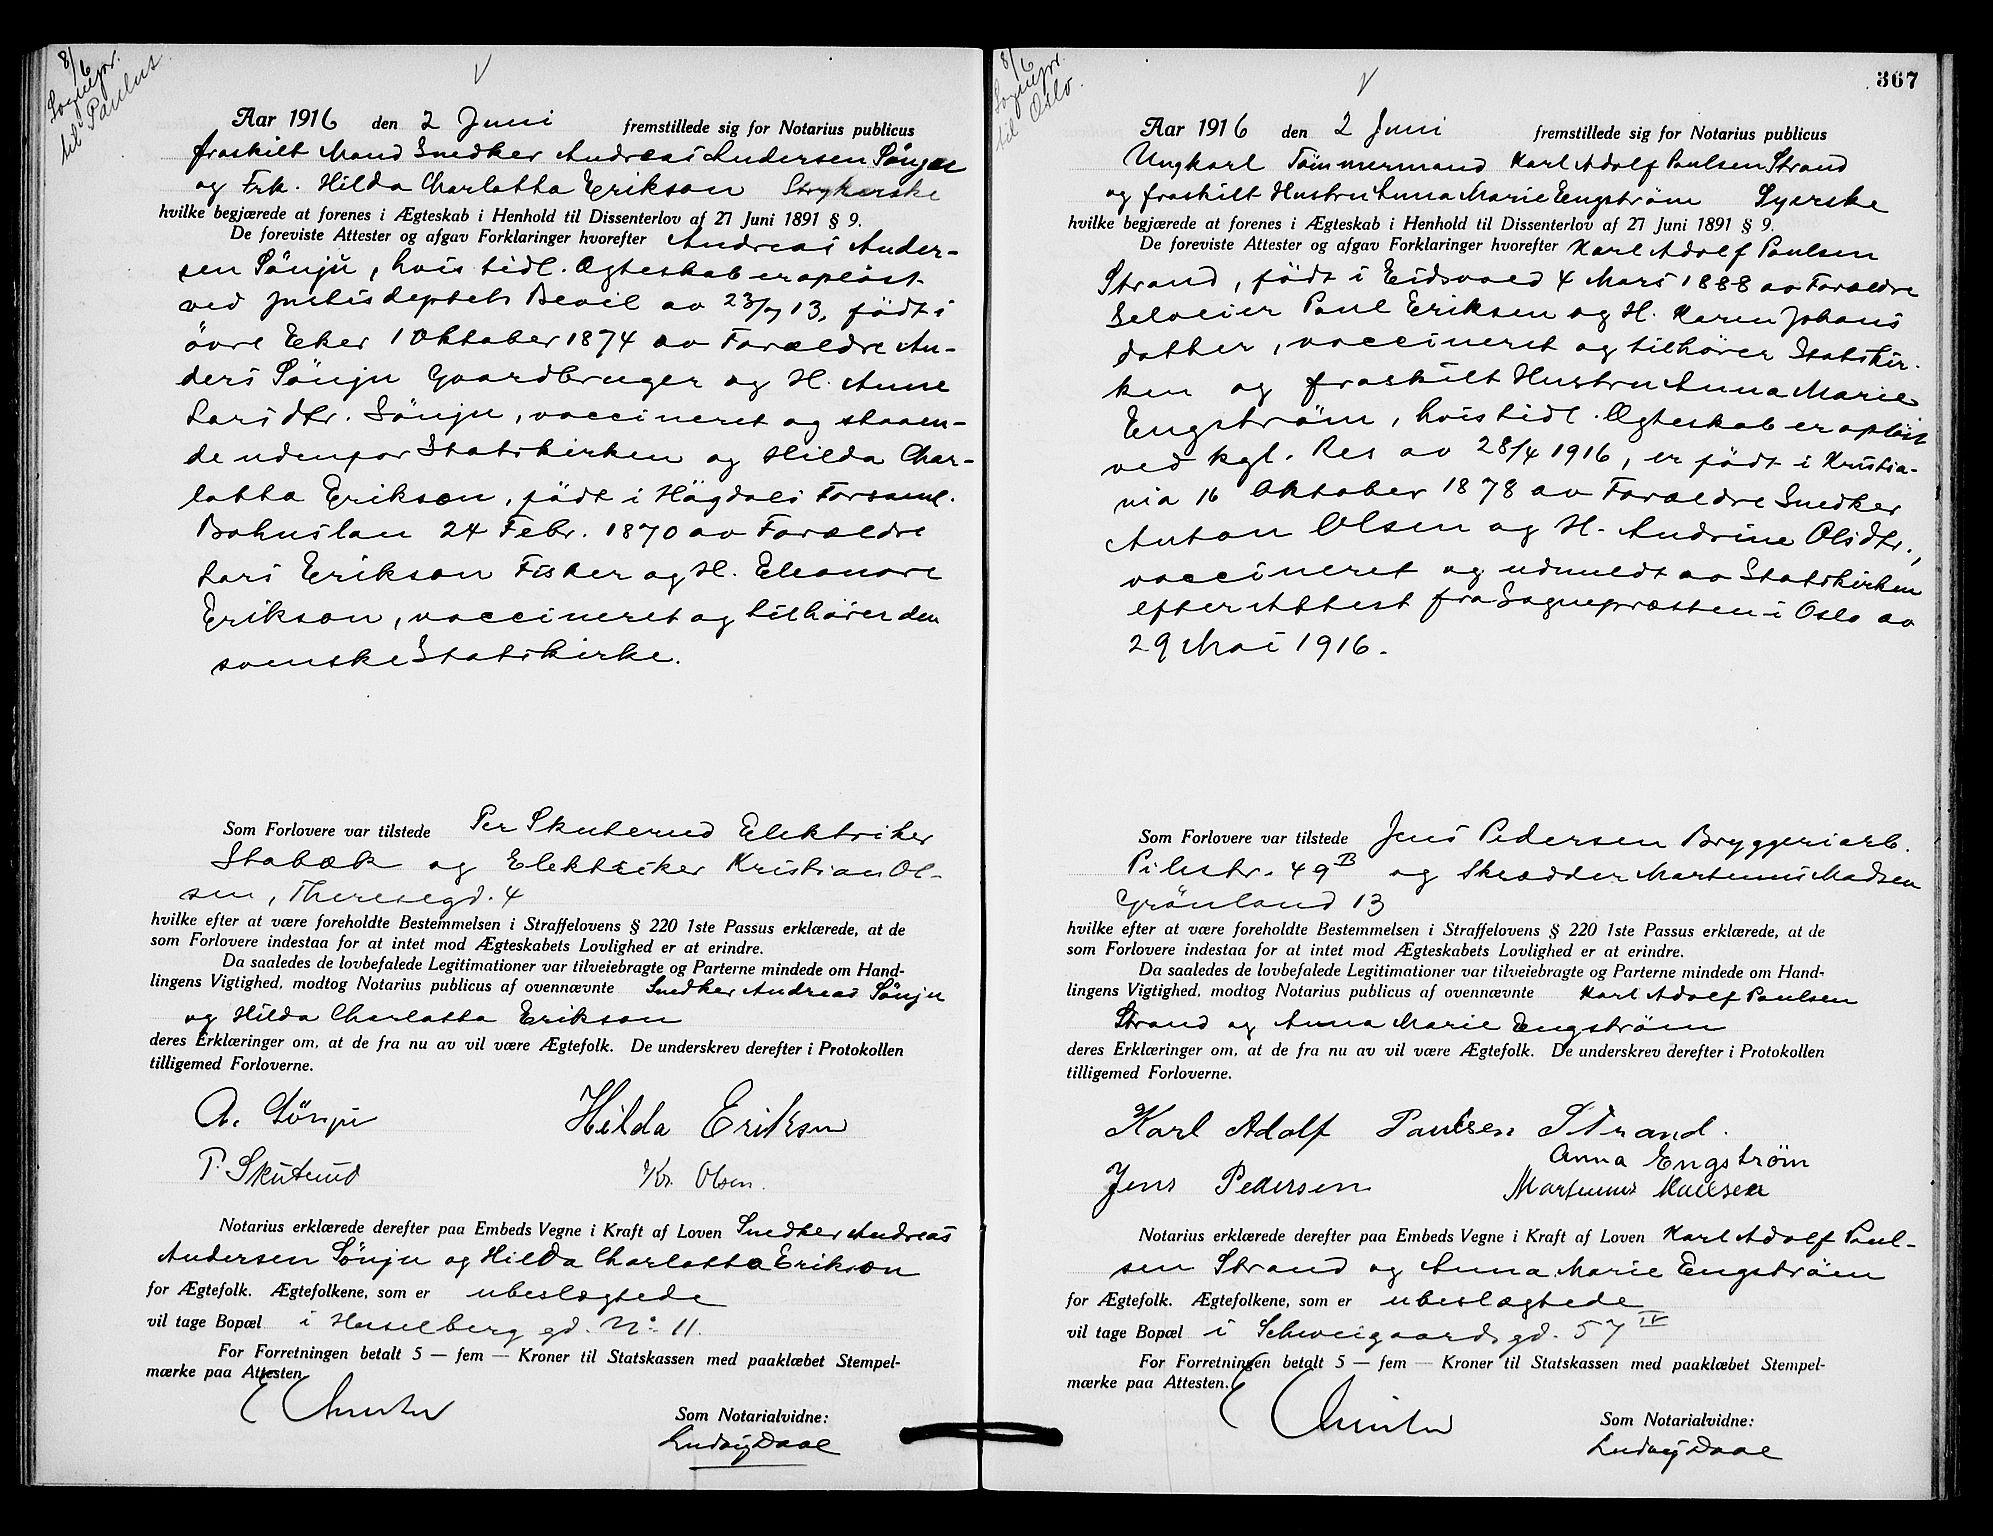 SAO, Oslo byfogd avd. I, L/Lb/Lbb/L0010: Notarialprotokoll, rekke II: Vigsler, 1914-1916, s. 466b-467a